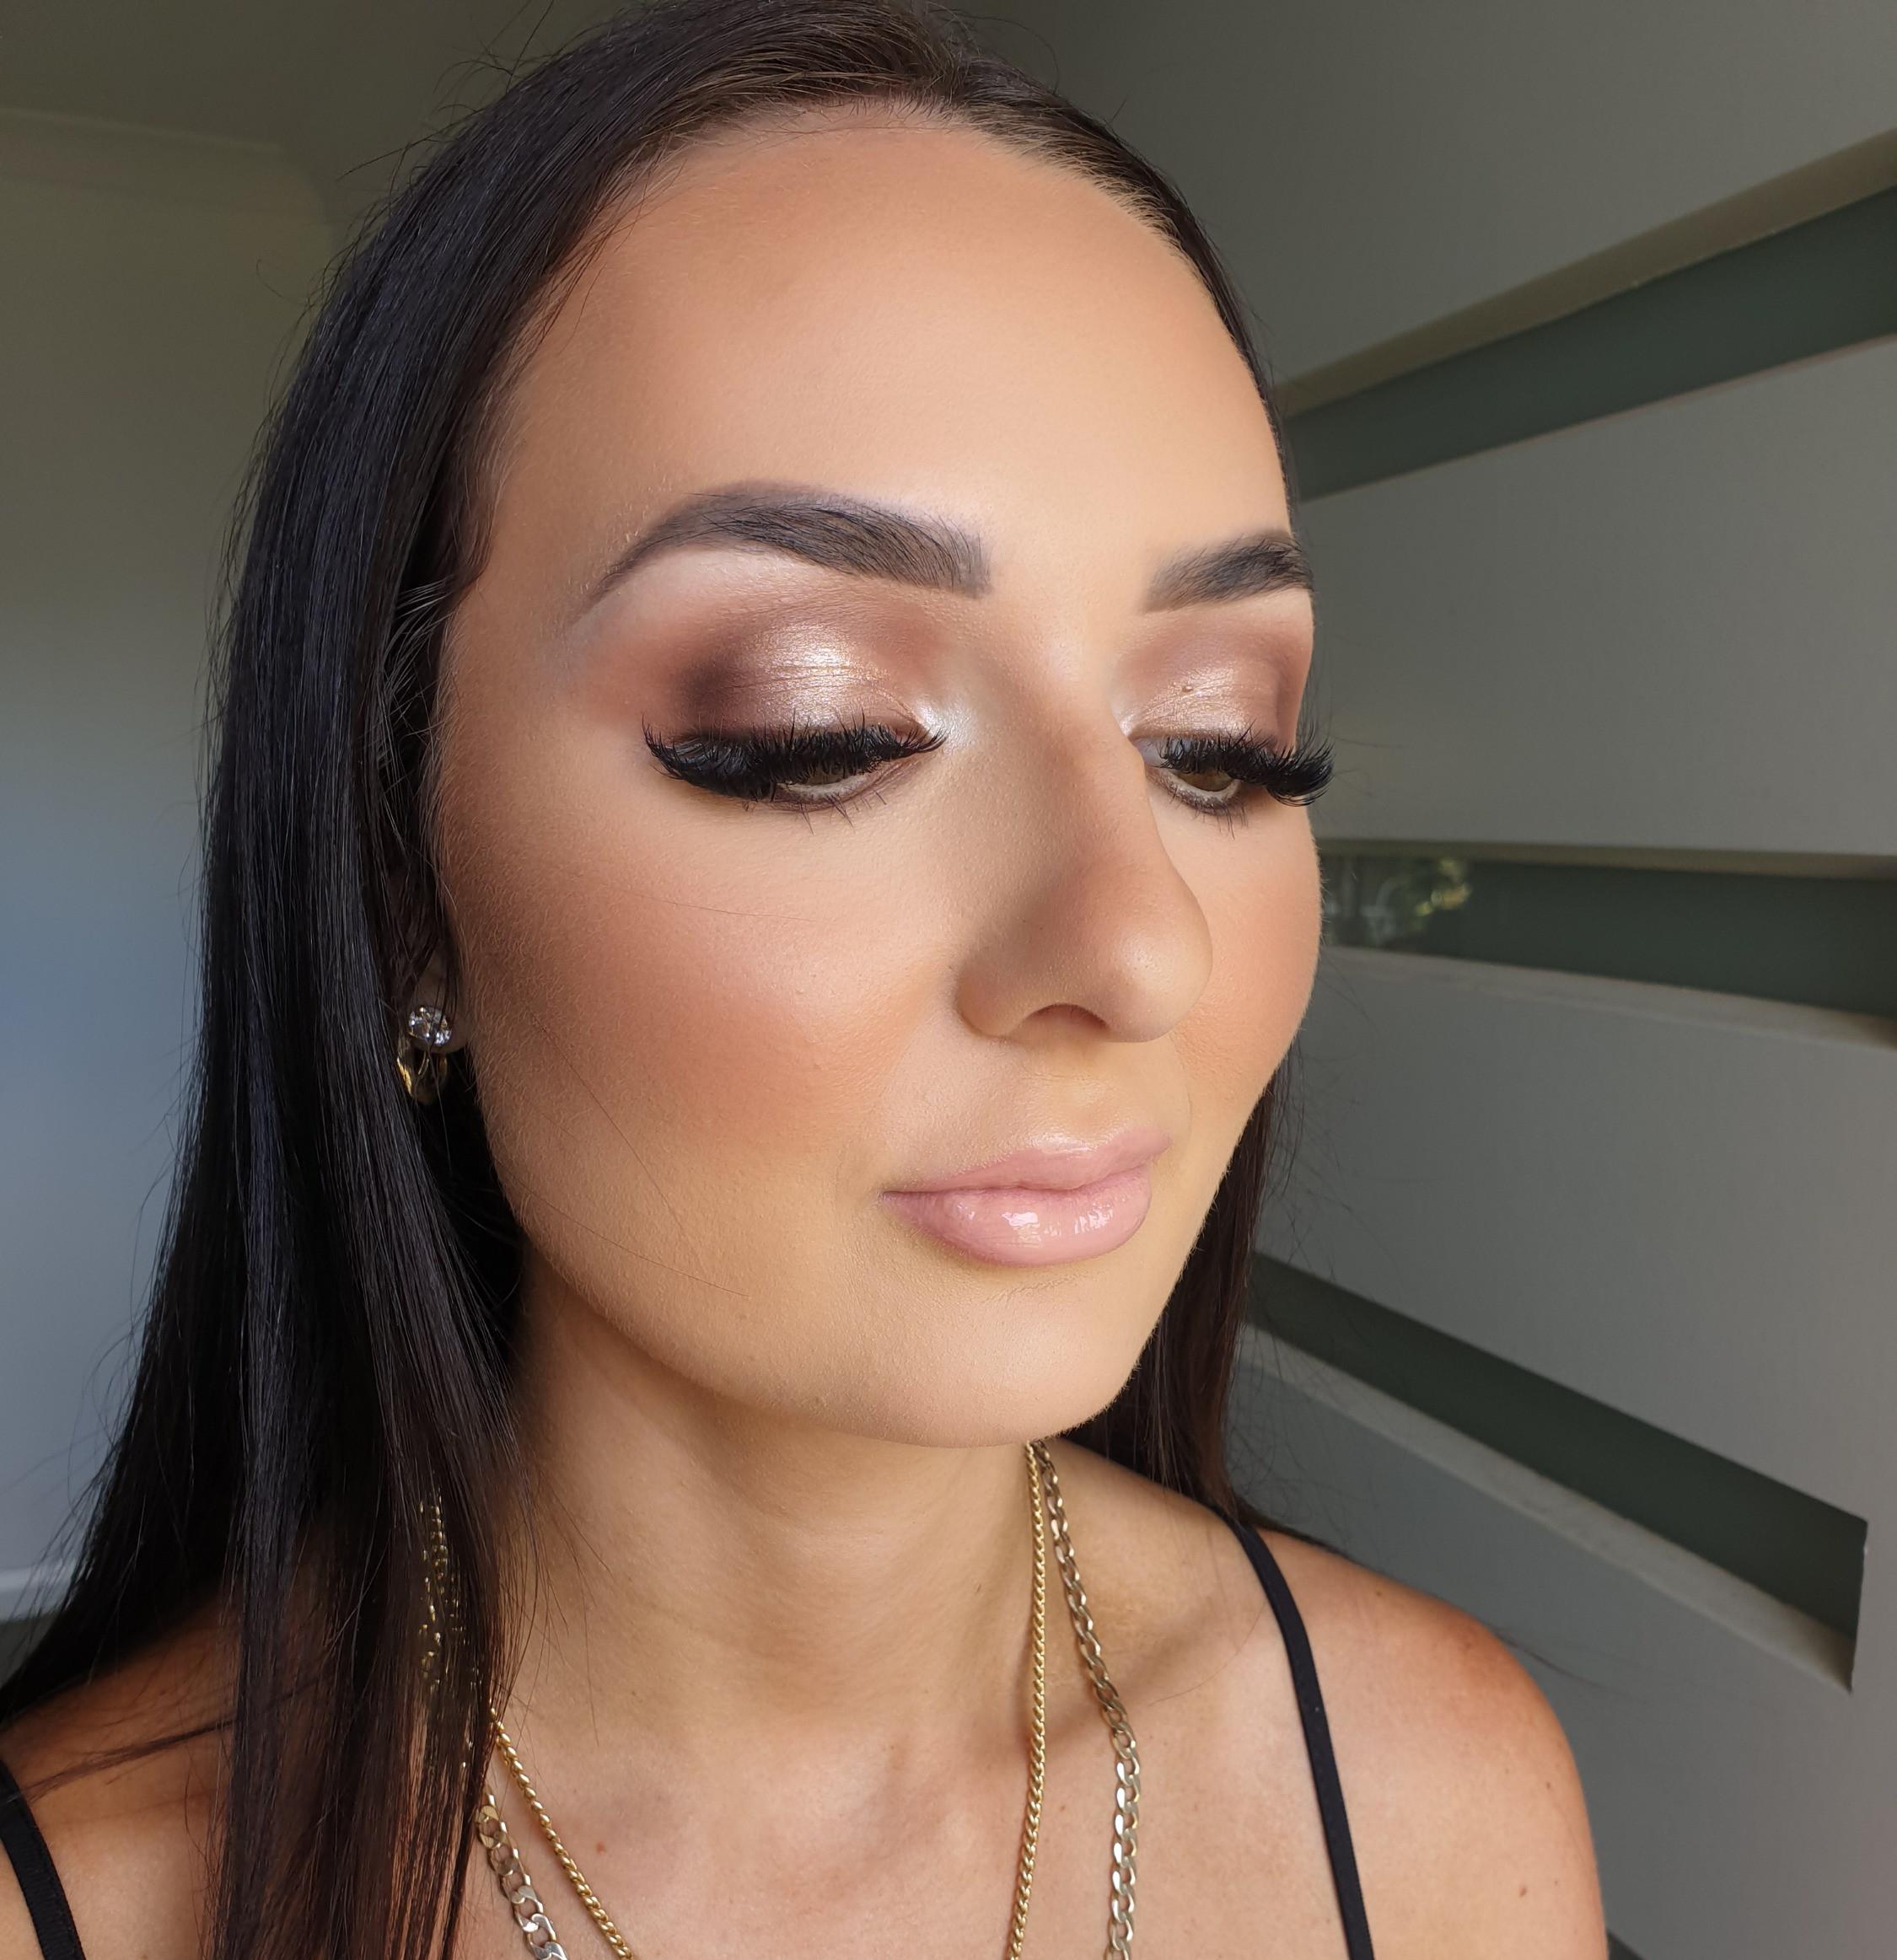 Makeup Application - Studio